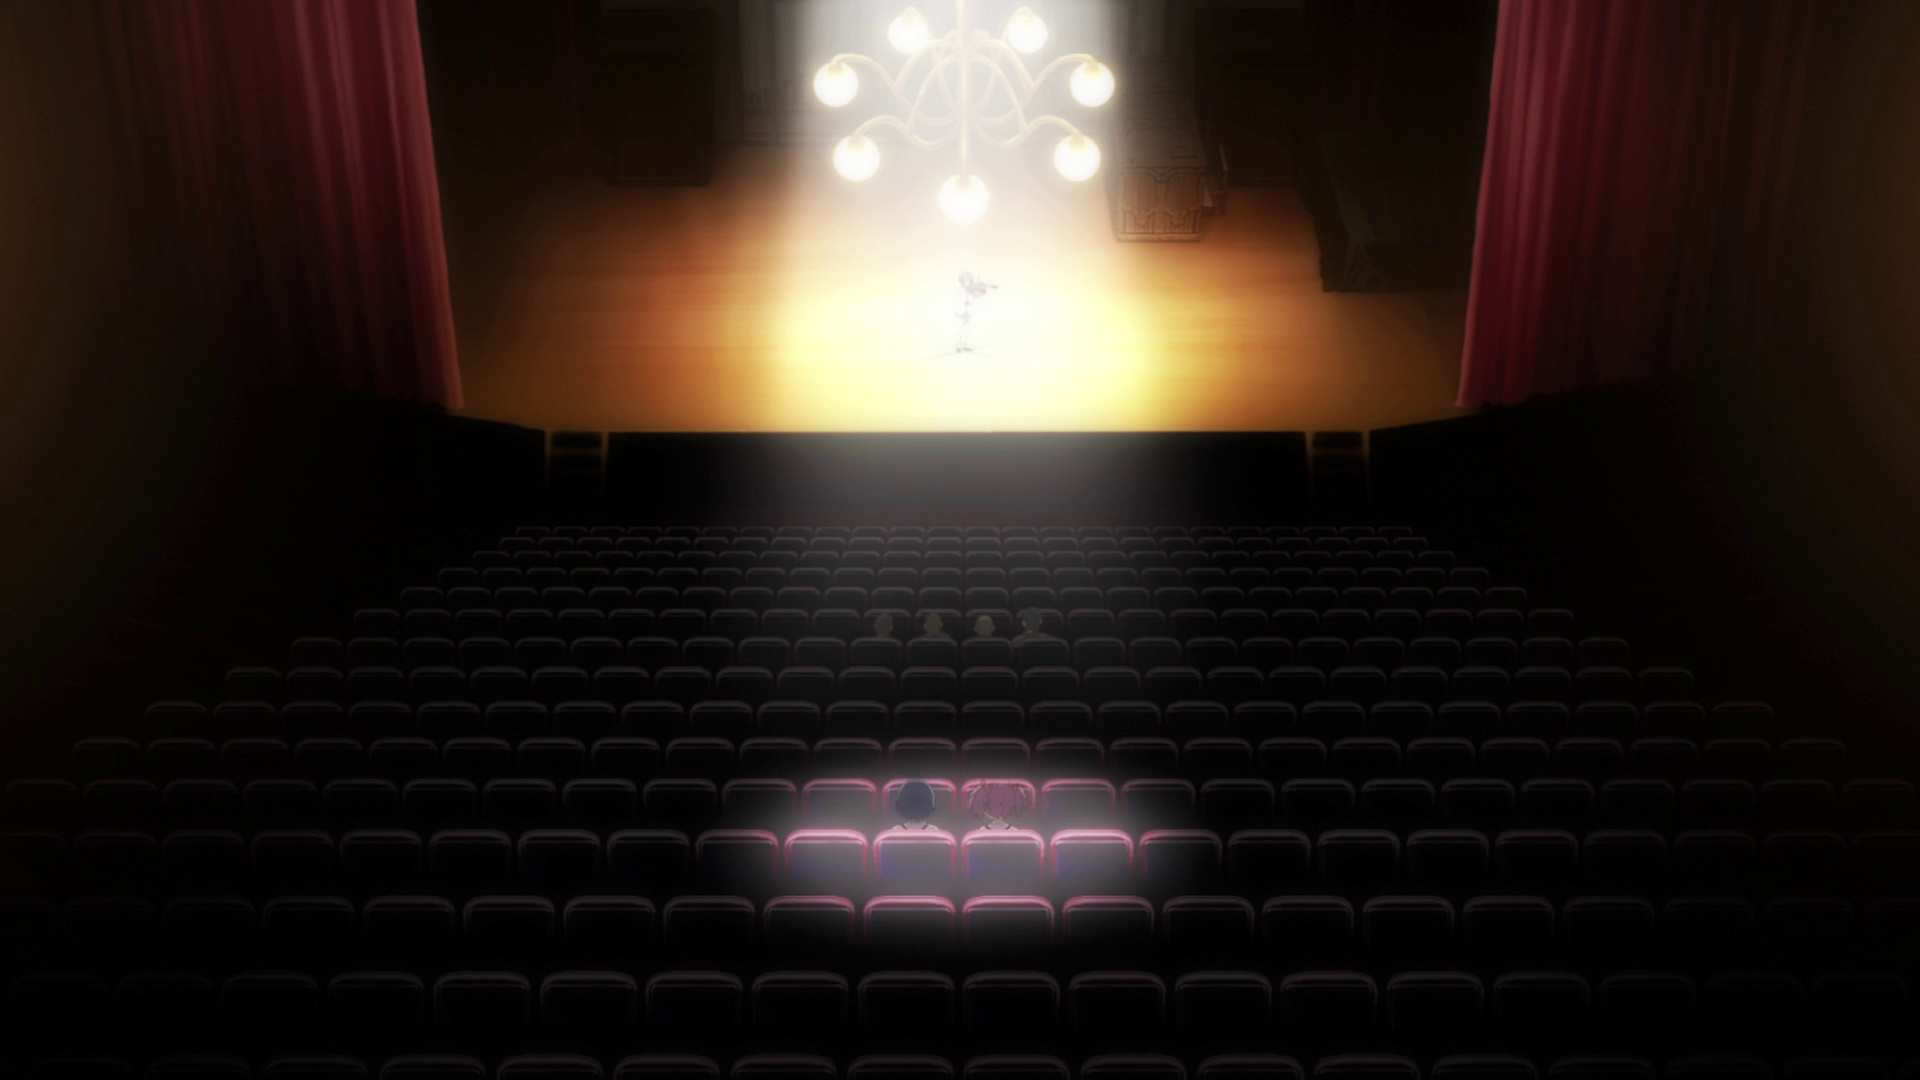 Galerie Puella Magi Madoka Magica the Movie Part II: Eternal 9